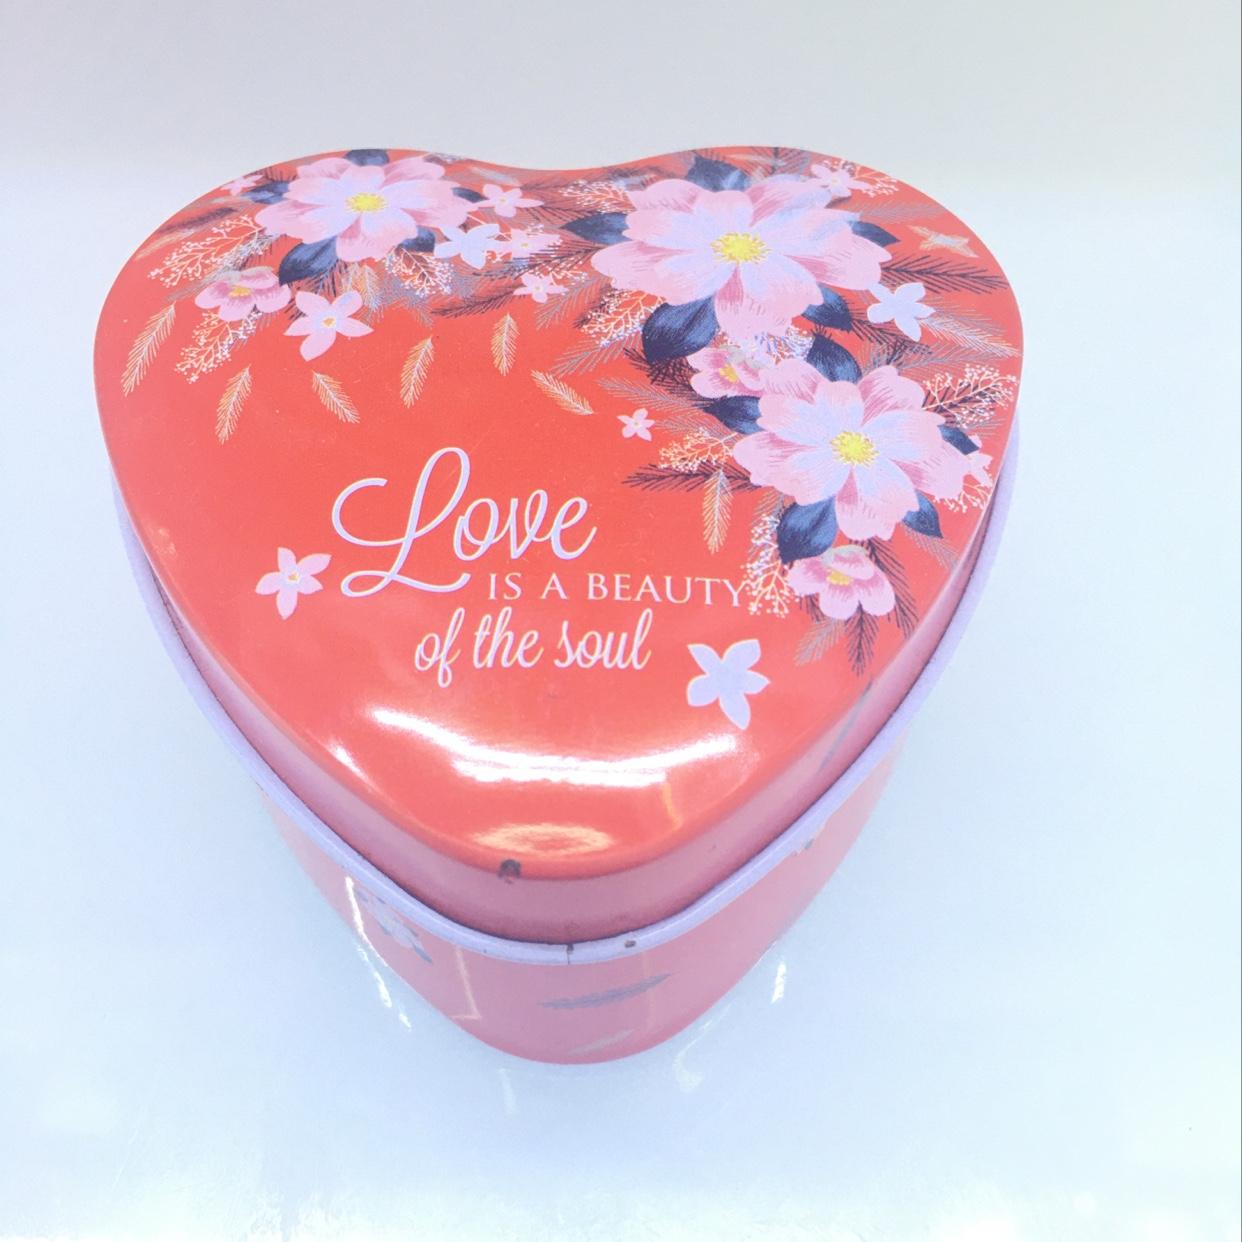 7.5*7.5*3.5cm  爱心形精美礼品铁盒 婚庆 礼物佳品x-16